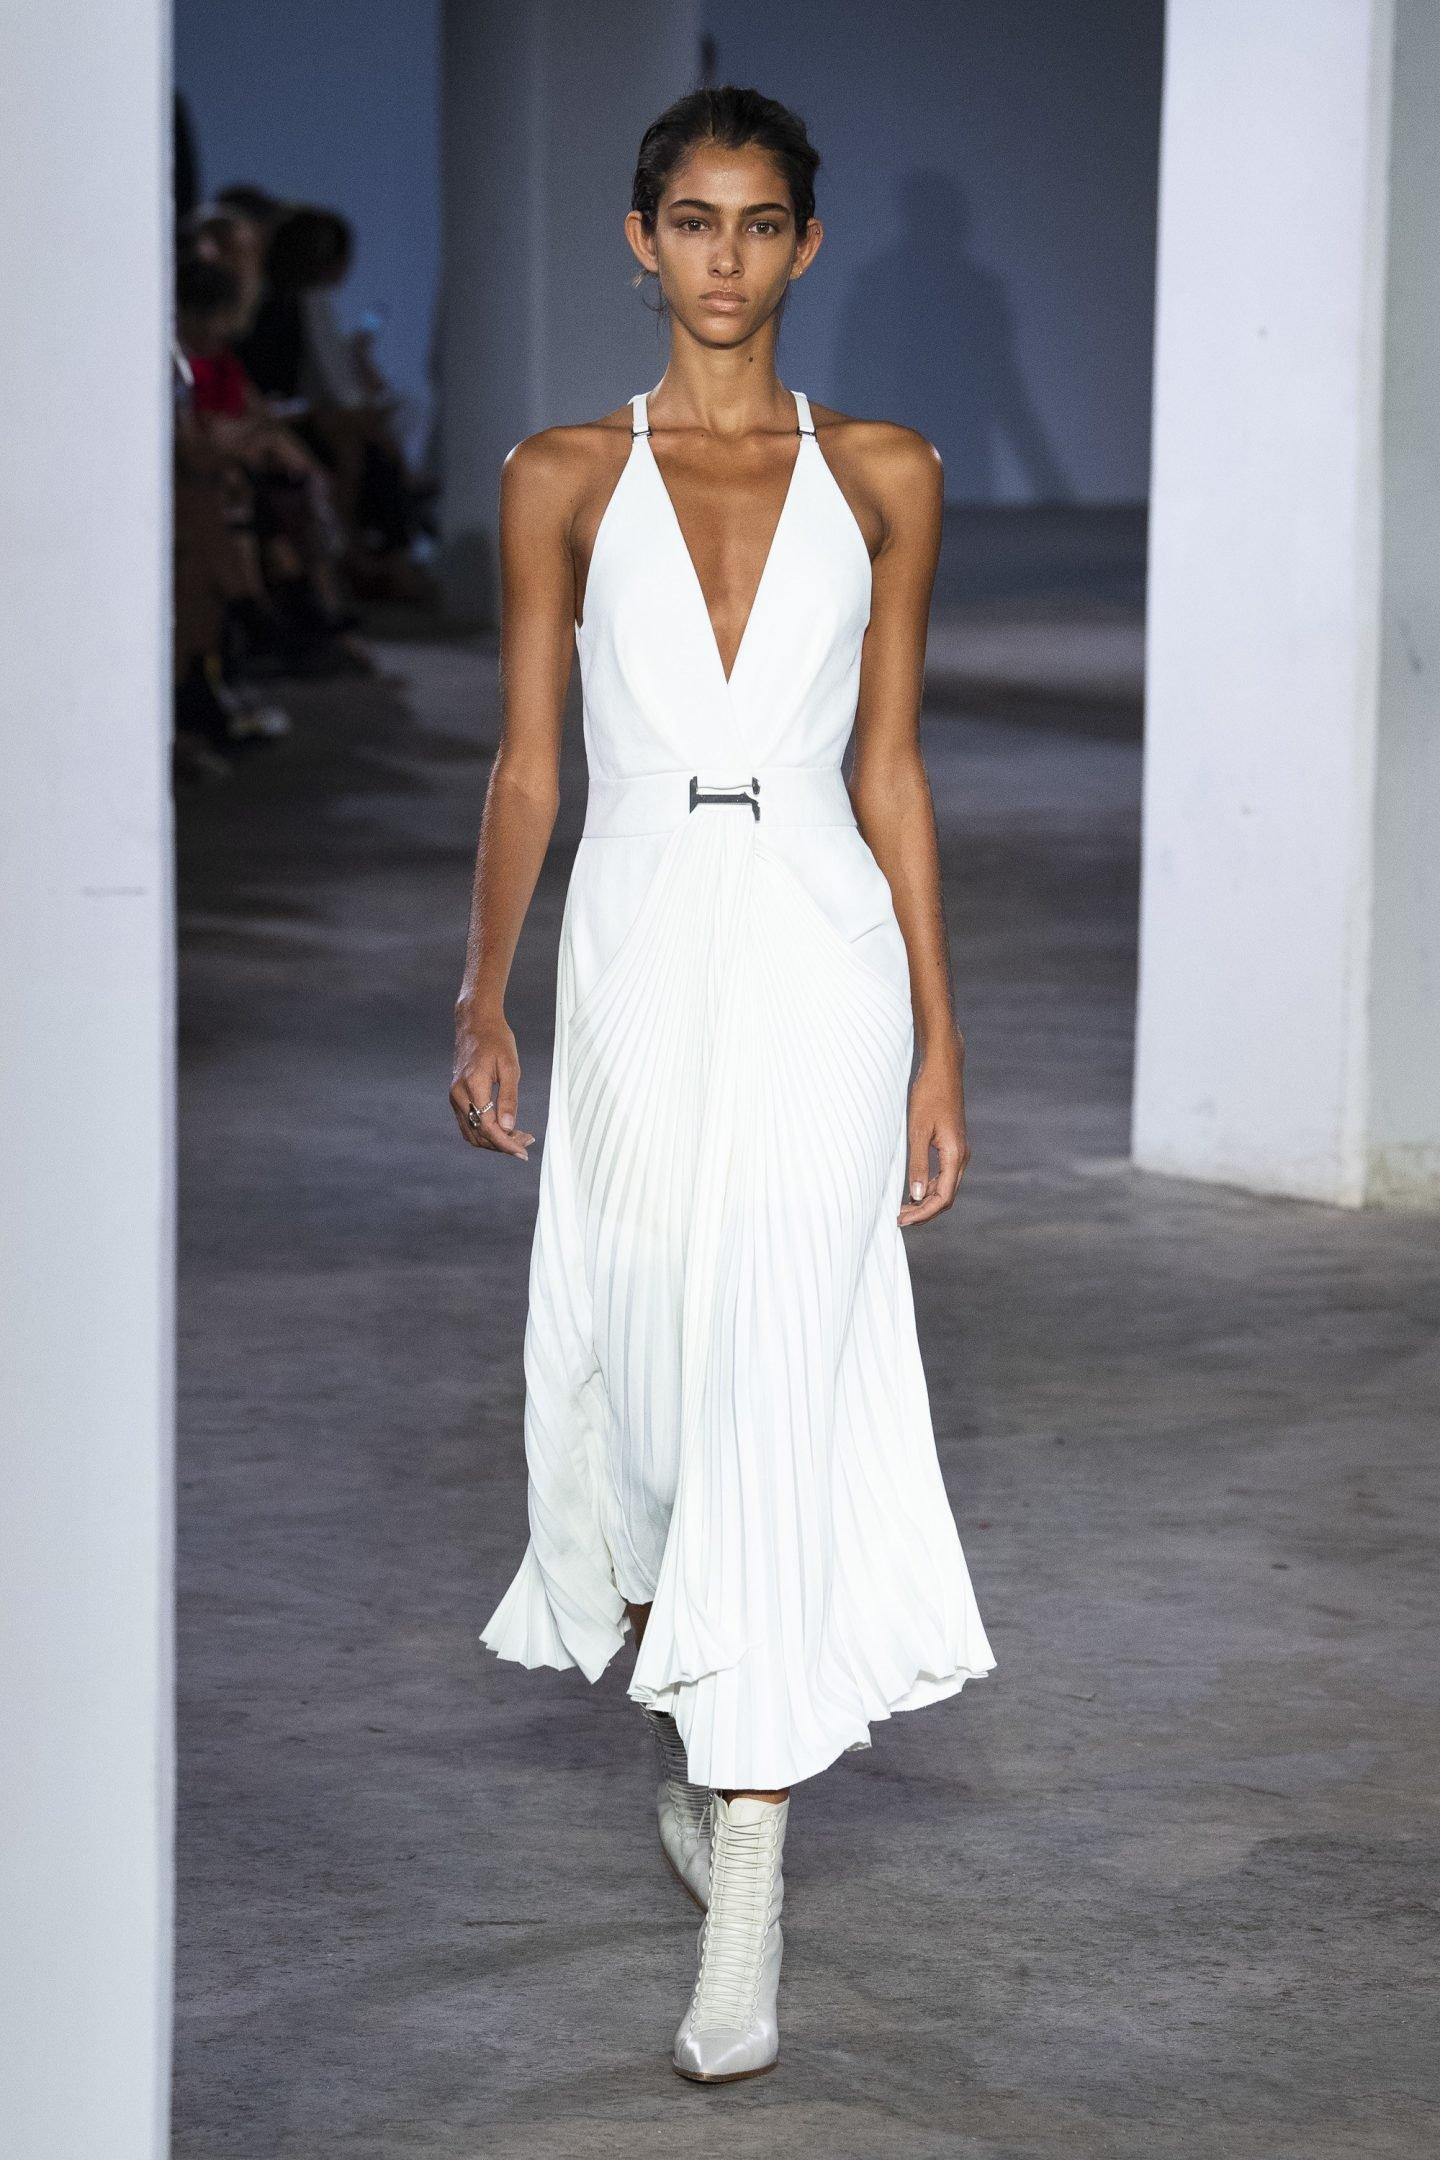 New York Fashion Week | Dion Lee | Image via vogue.com